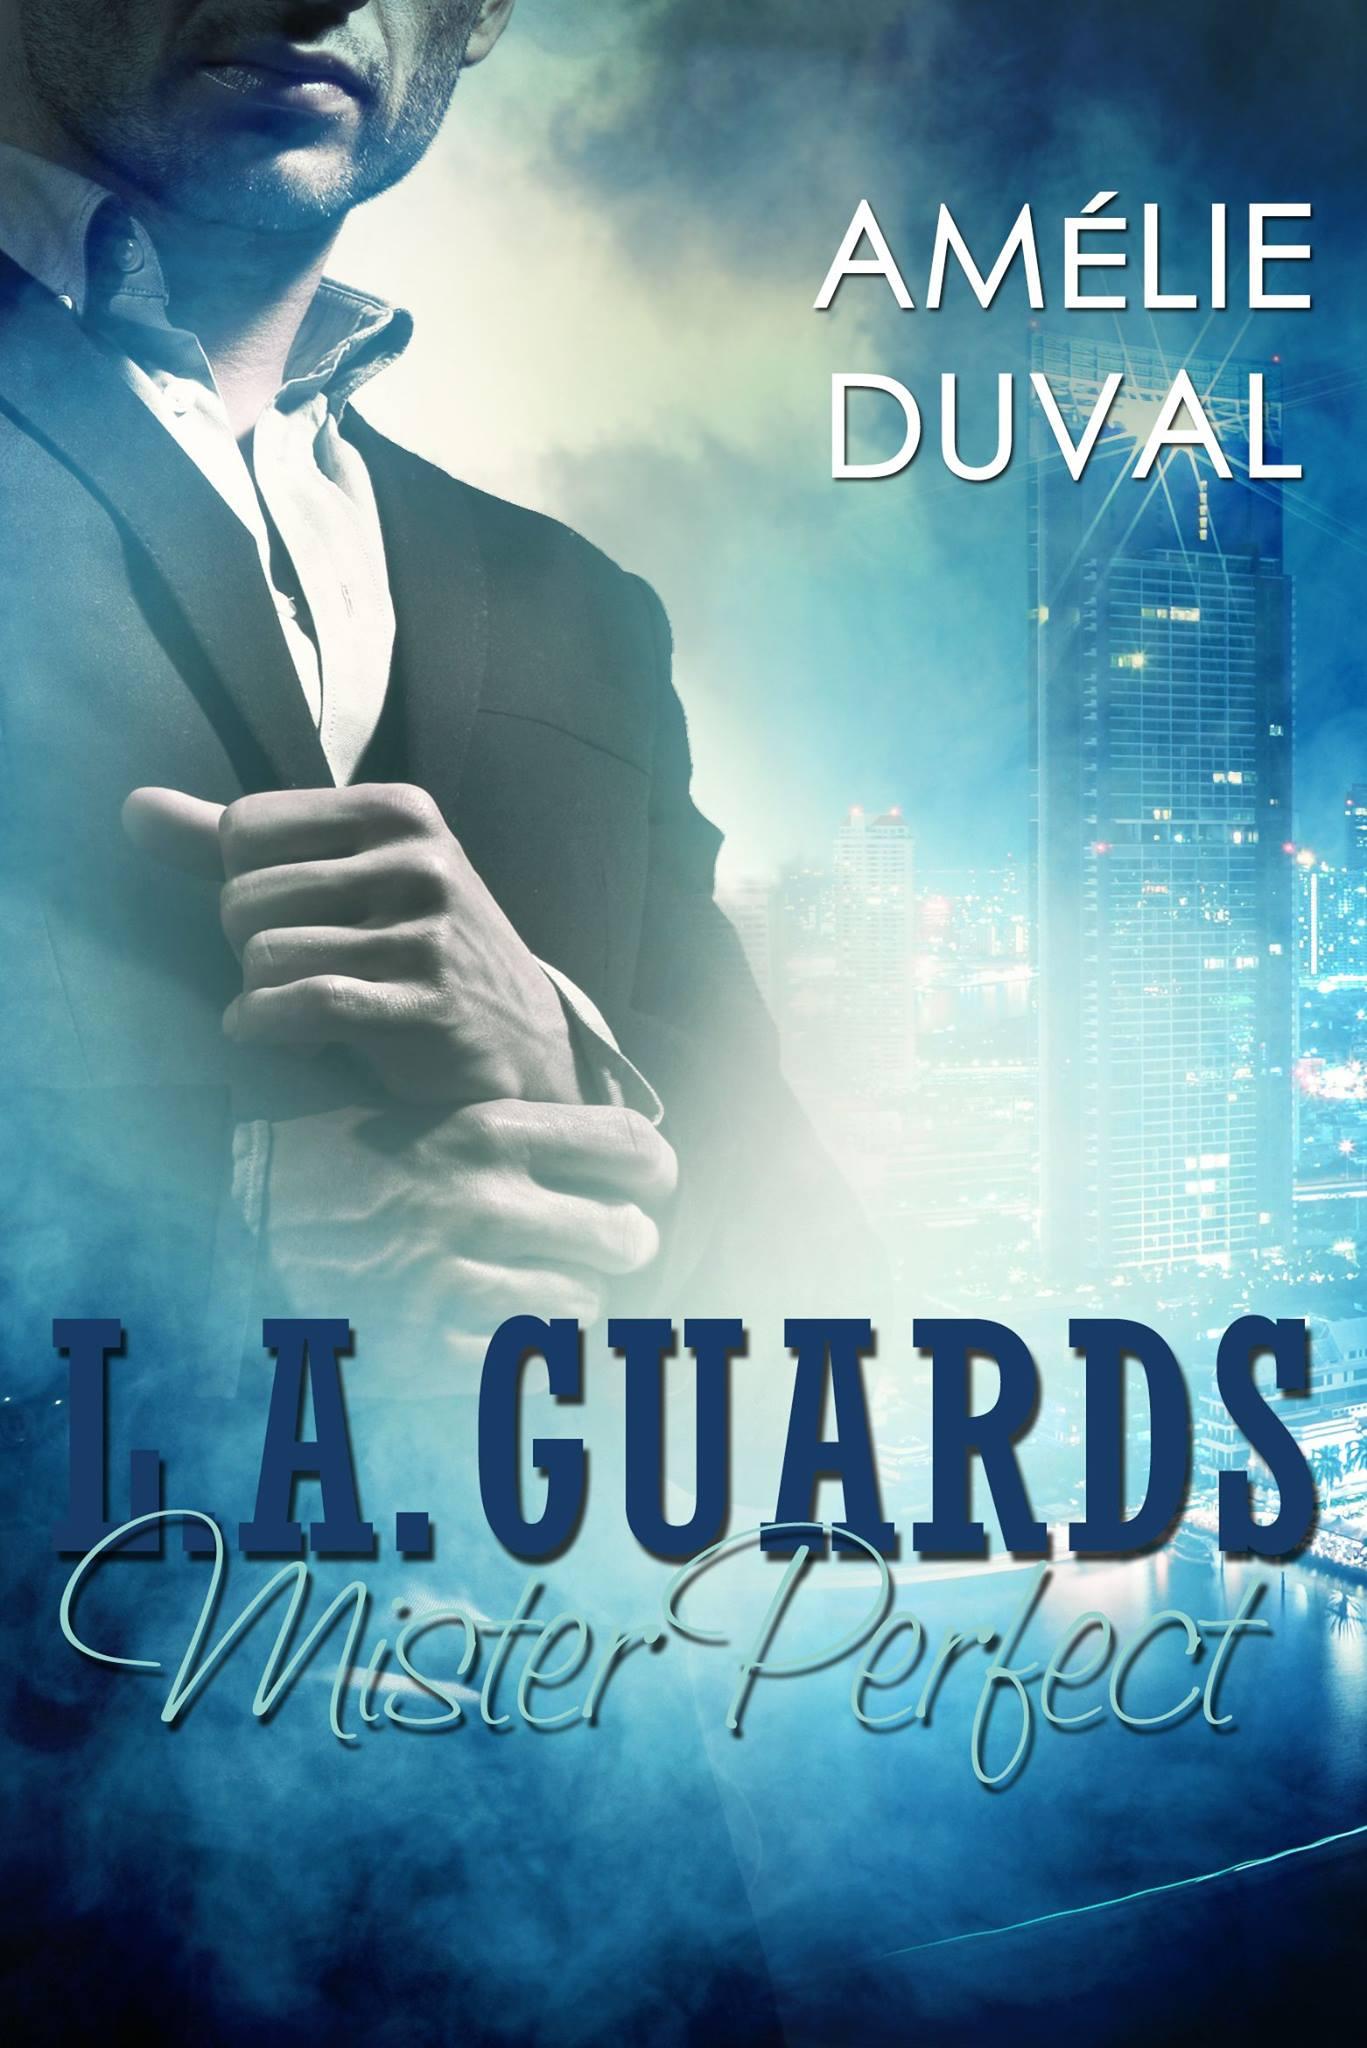 LA Guards Mister Perfect